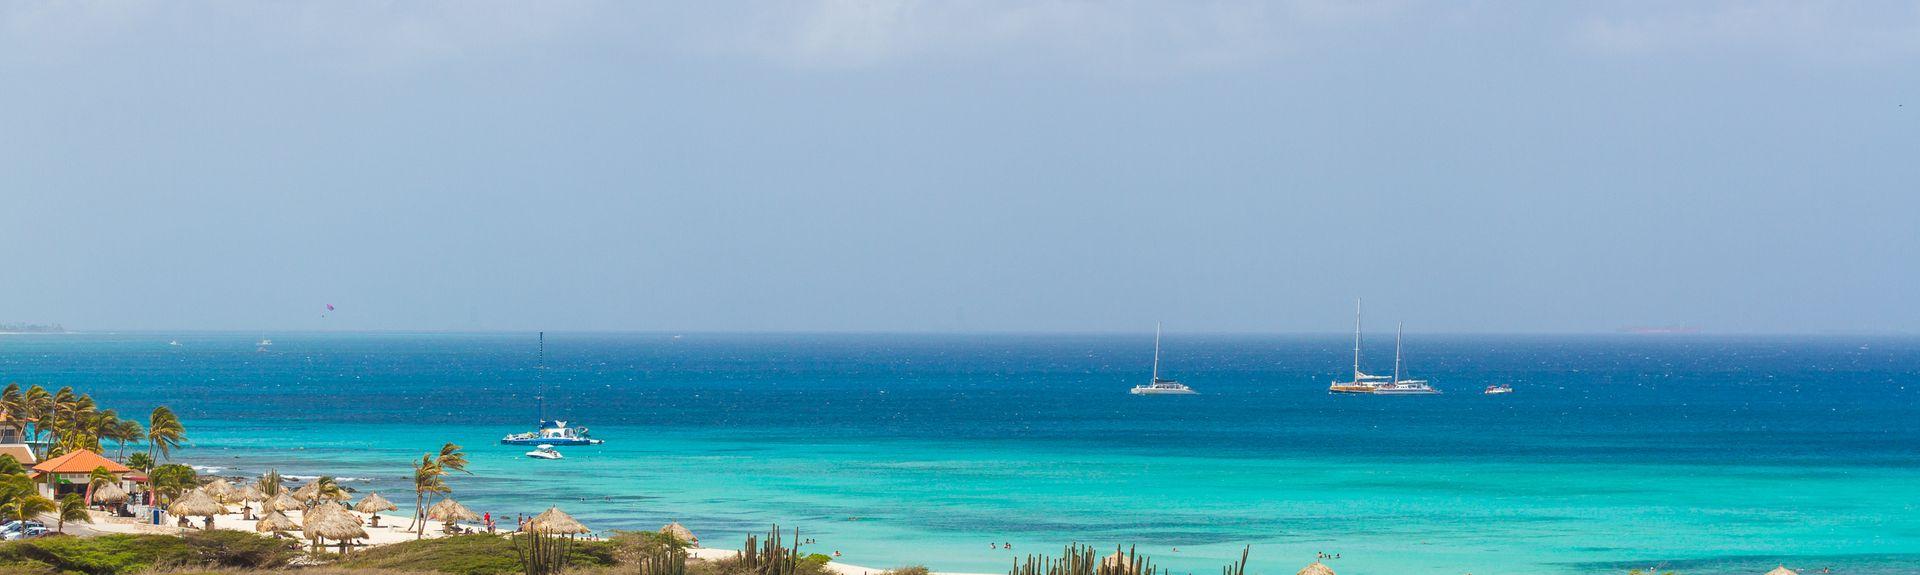 Arashi Beach, Noord, Aruba